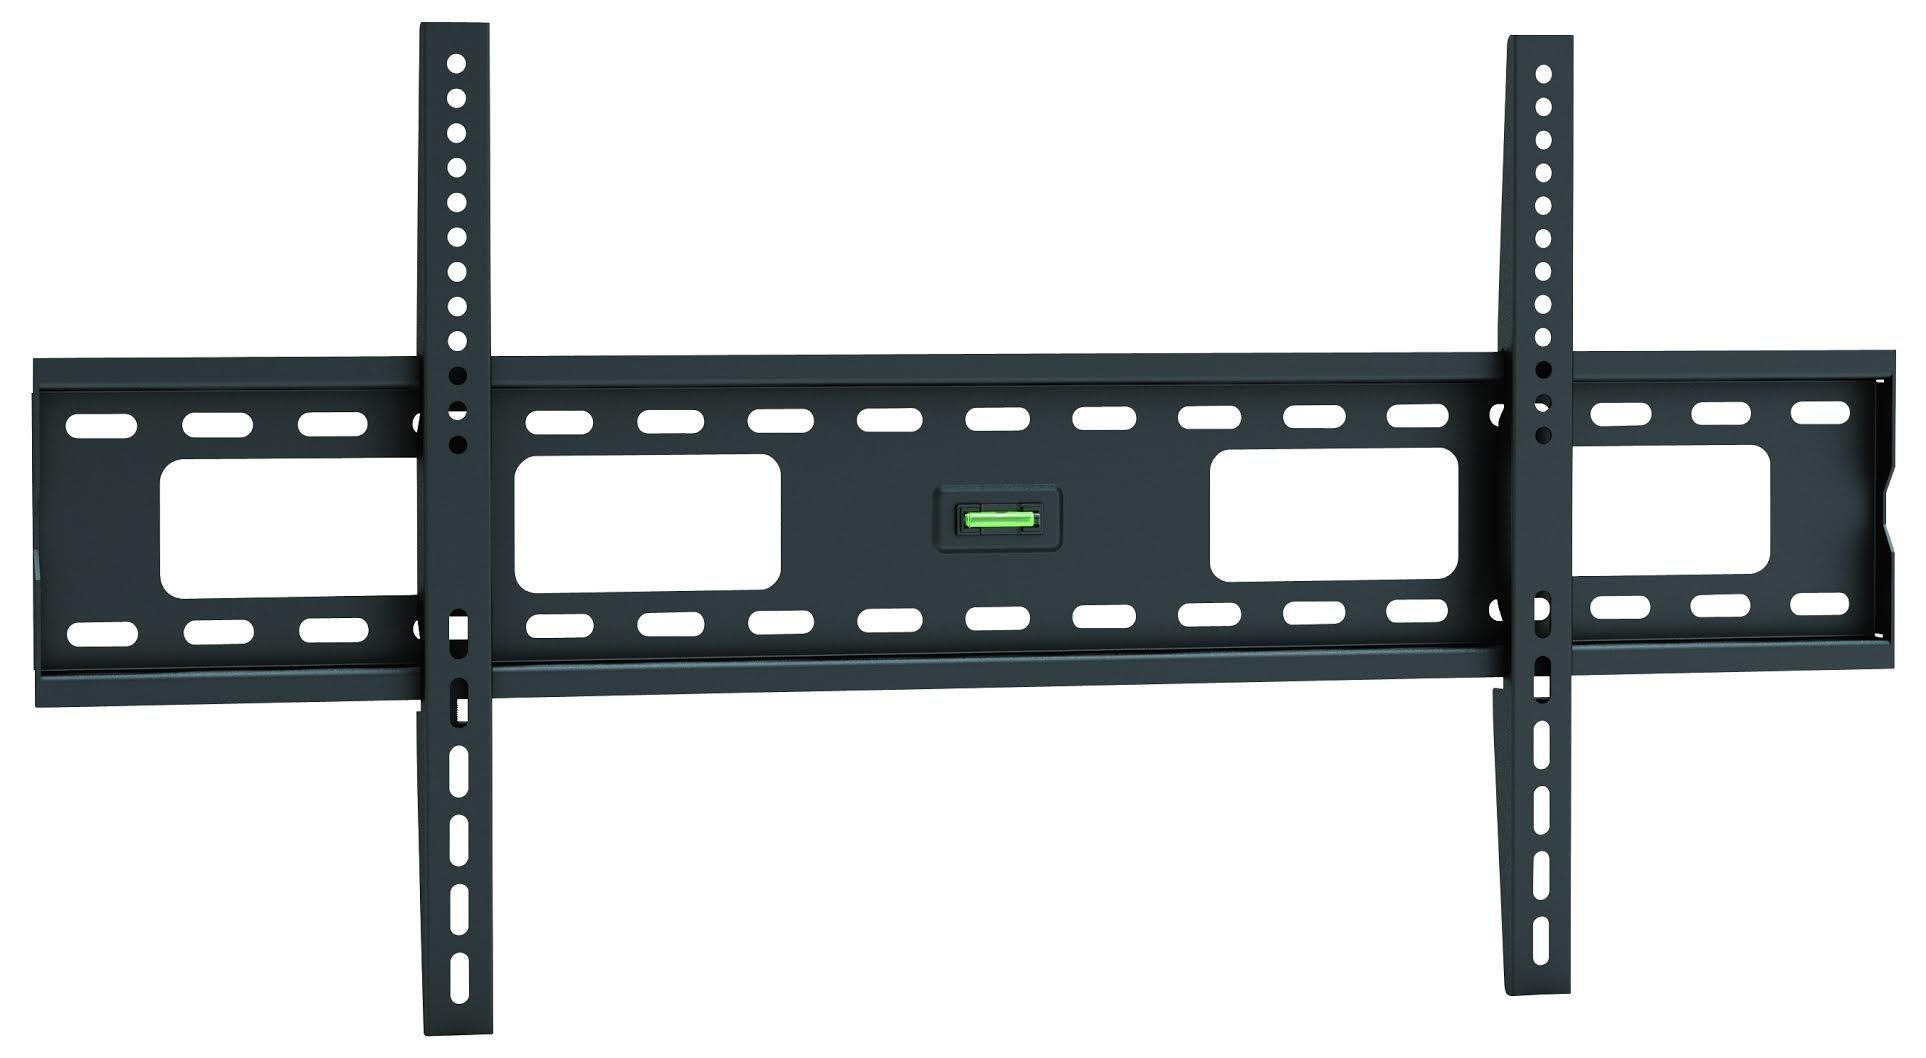 EASY MOUNT – Extra Ultra Slim Flat TV Wall Mount Bracket for Samsung UN55MU6300 Super Low 1.4'' Profile Design - Heavy Duty Steel - Simple to Install!